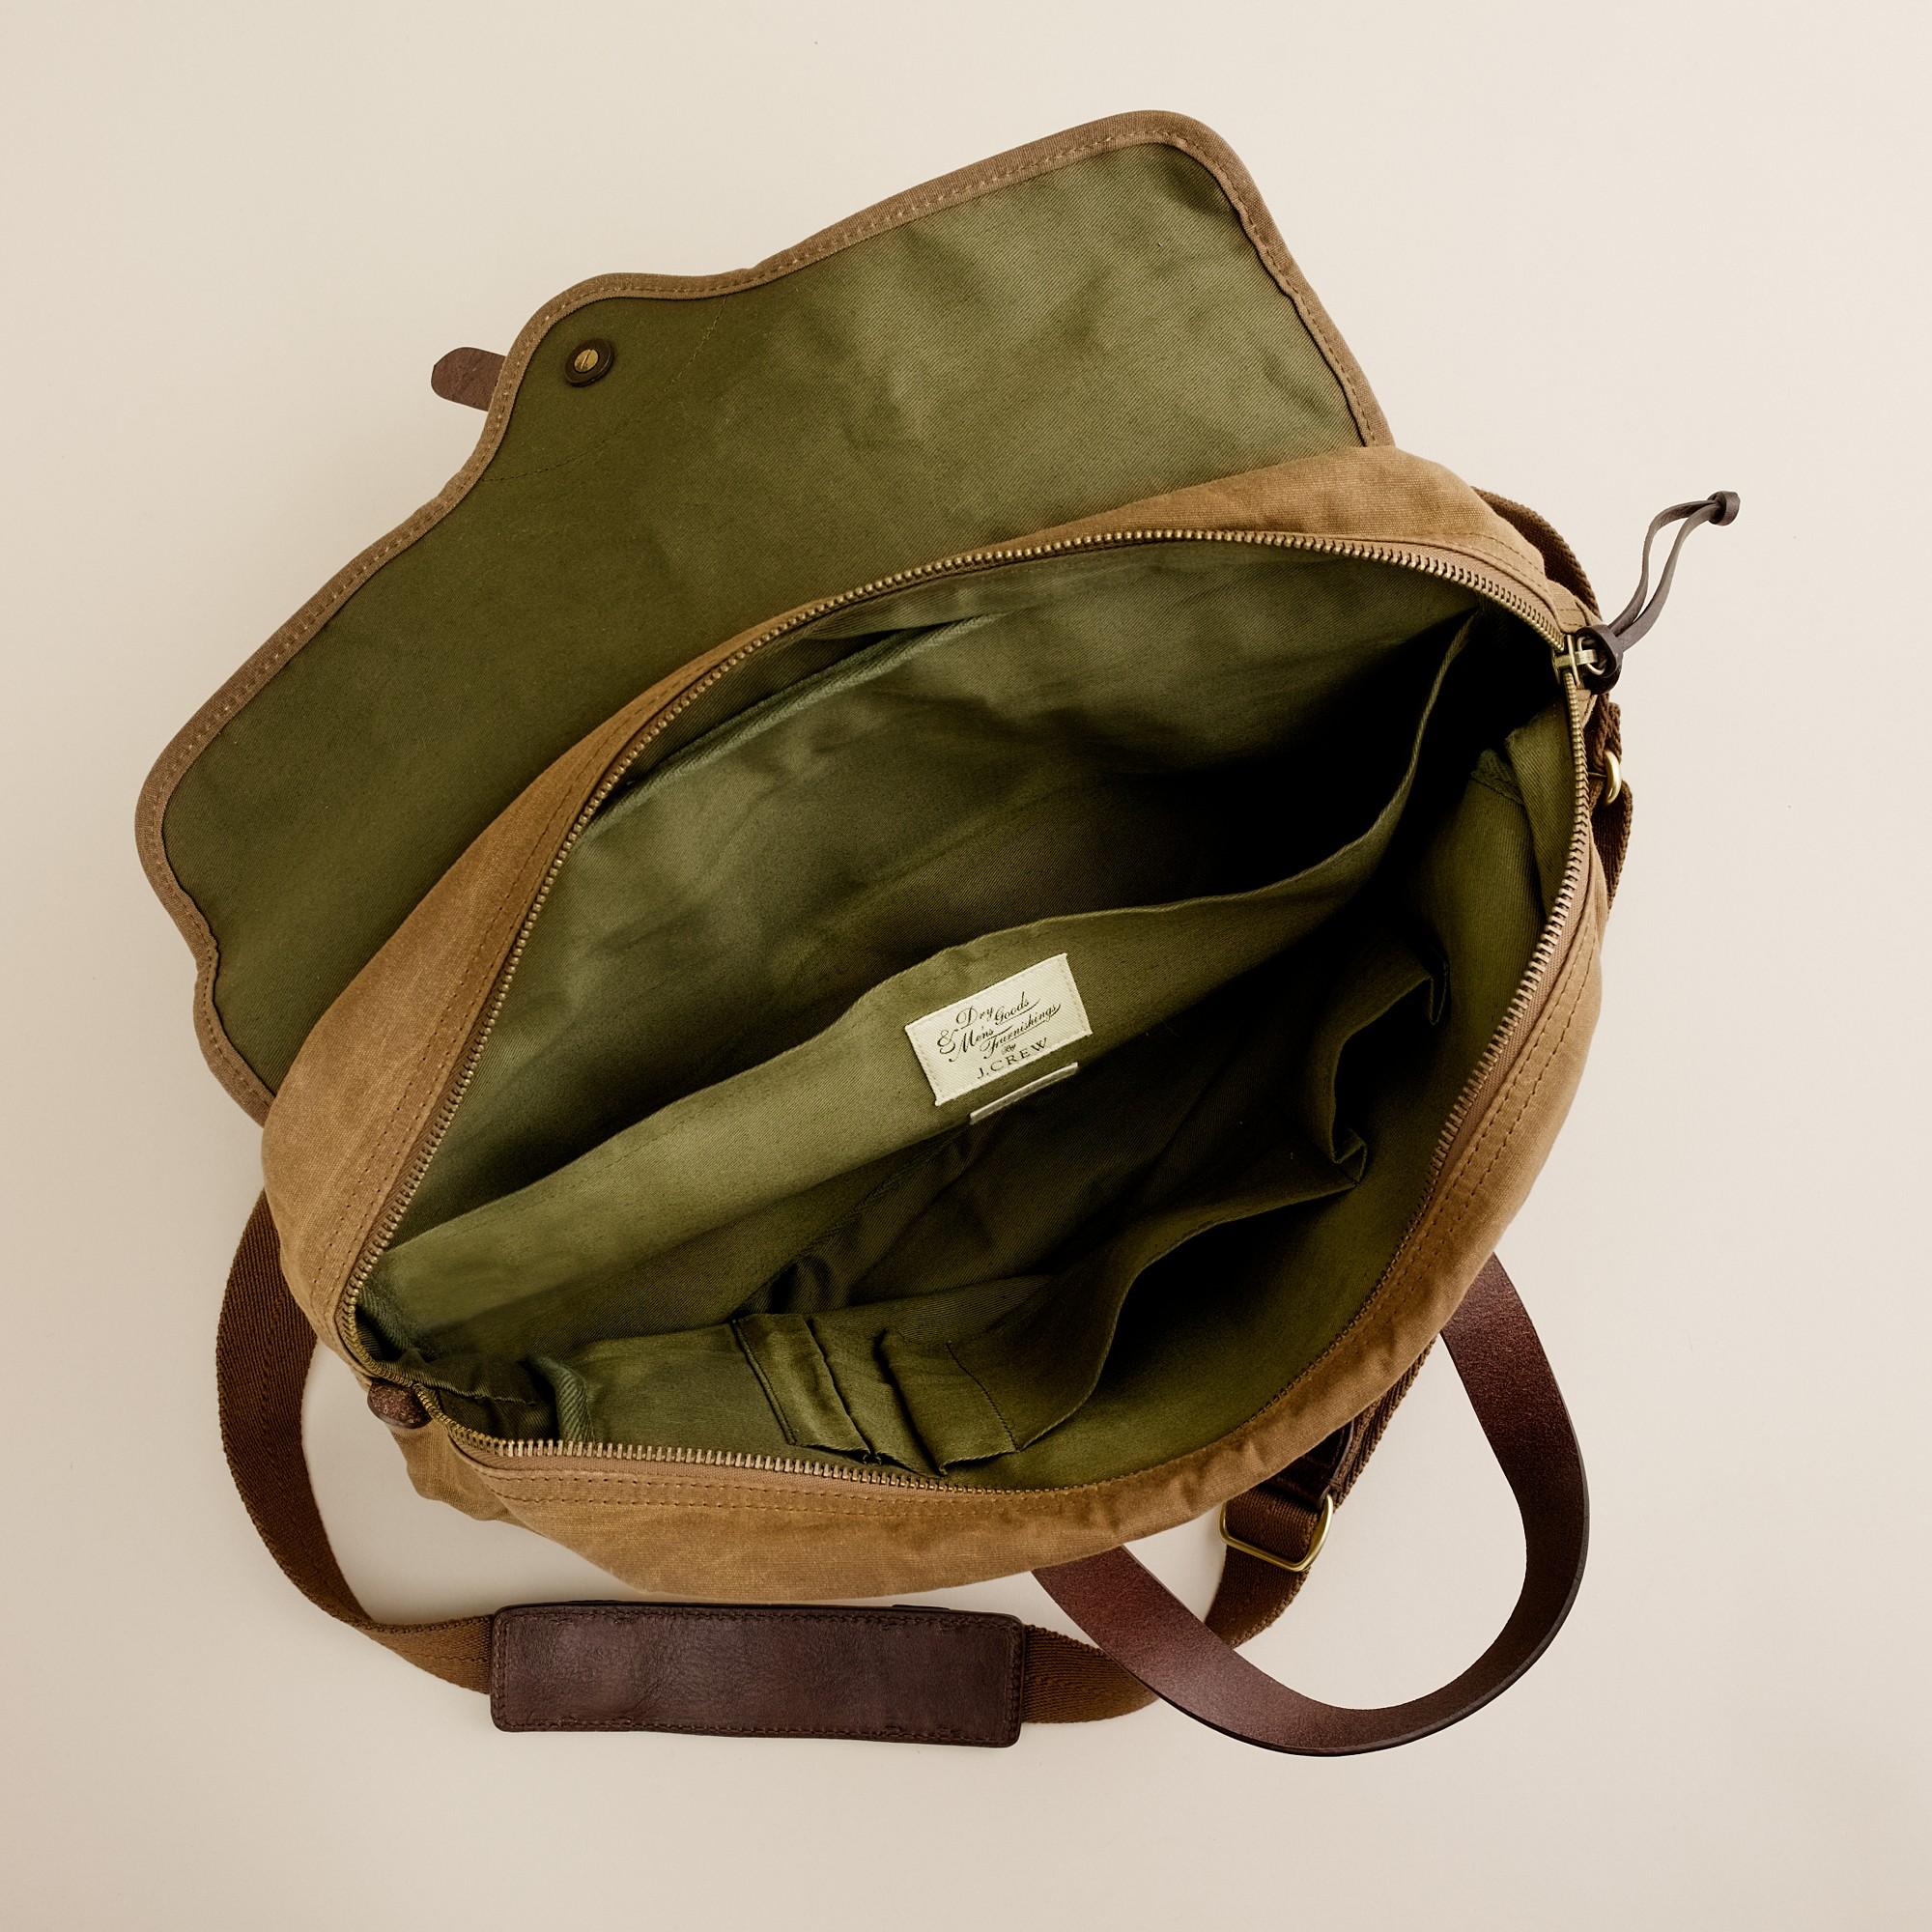 43e8538c14 Lyst - J.Crew Abingdon Laptop Bag in Natural for Men